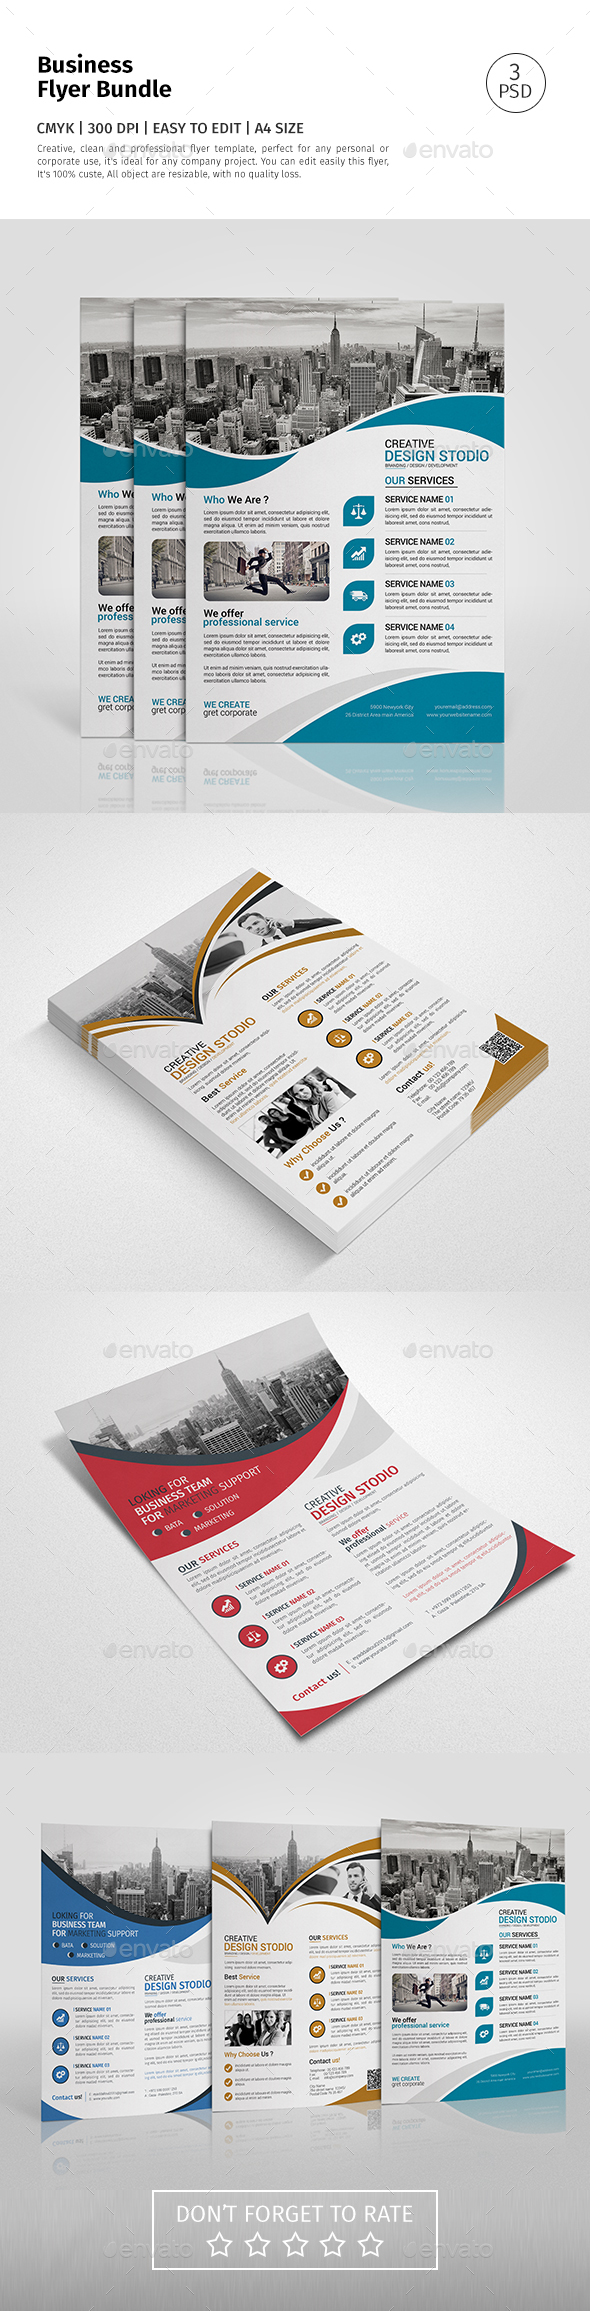 Corporate Flyer Bundle 03 - Corporate Flyers